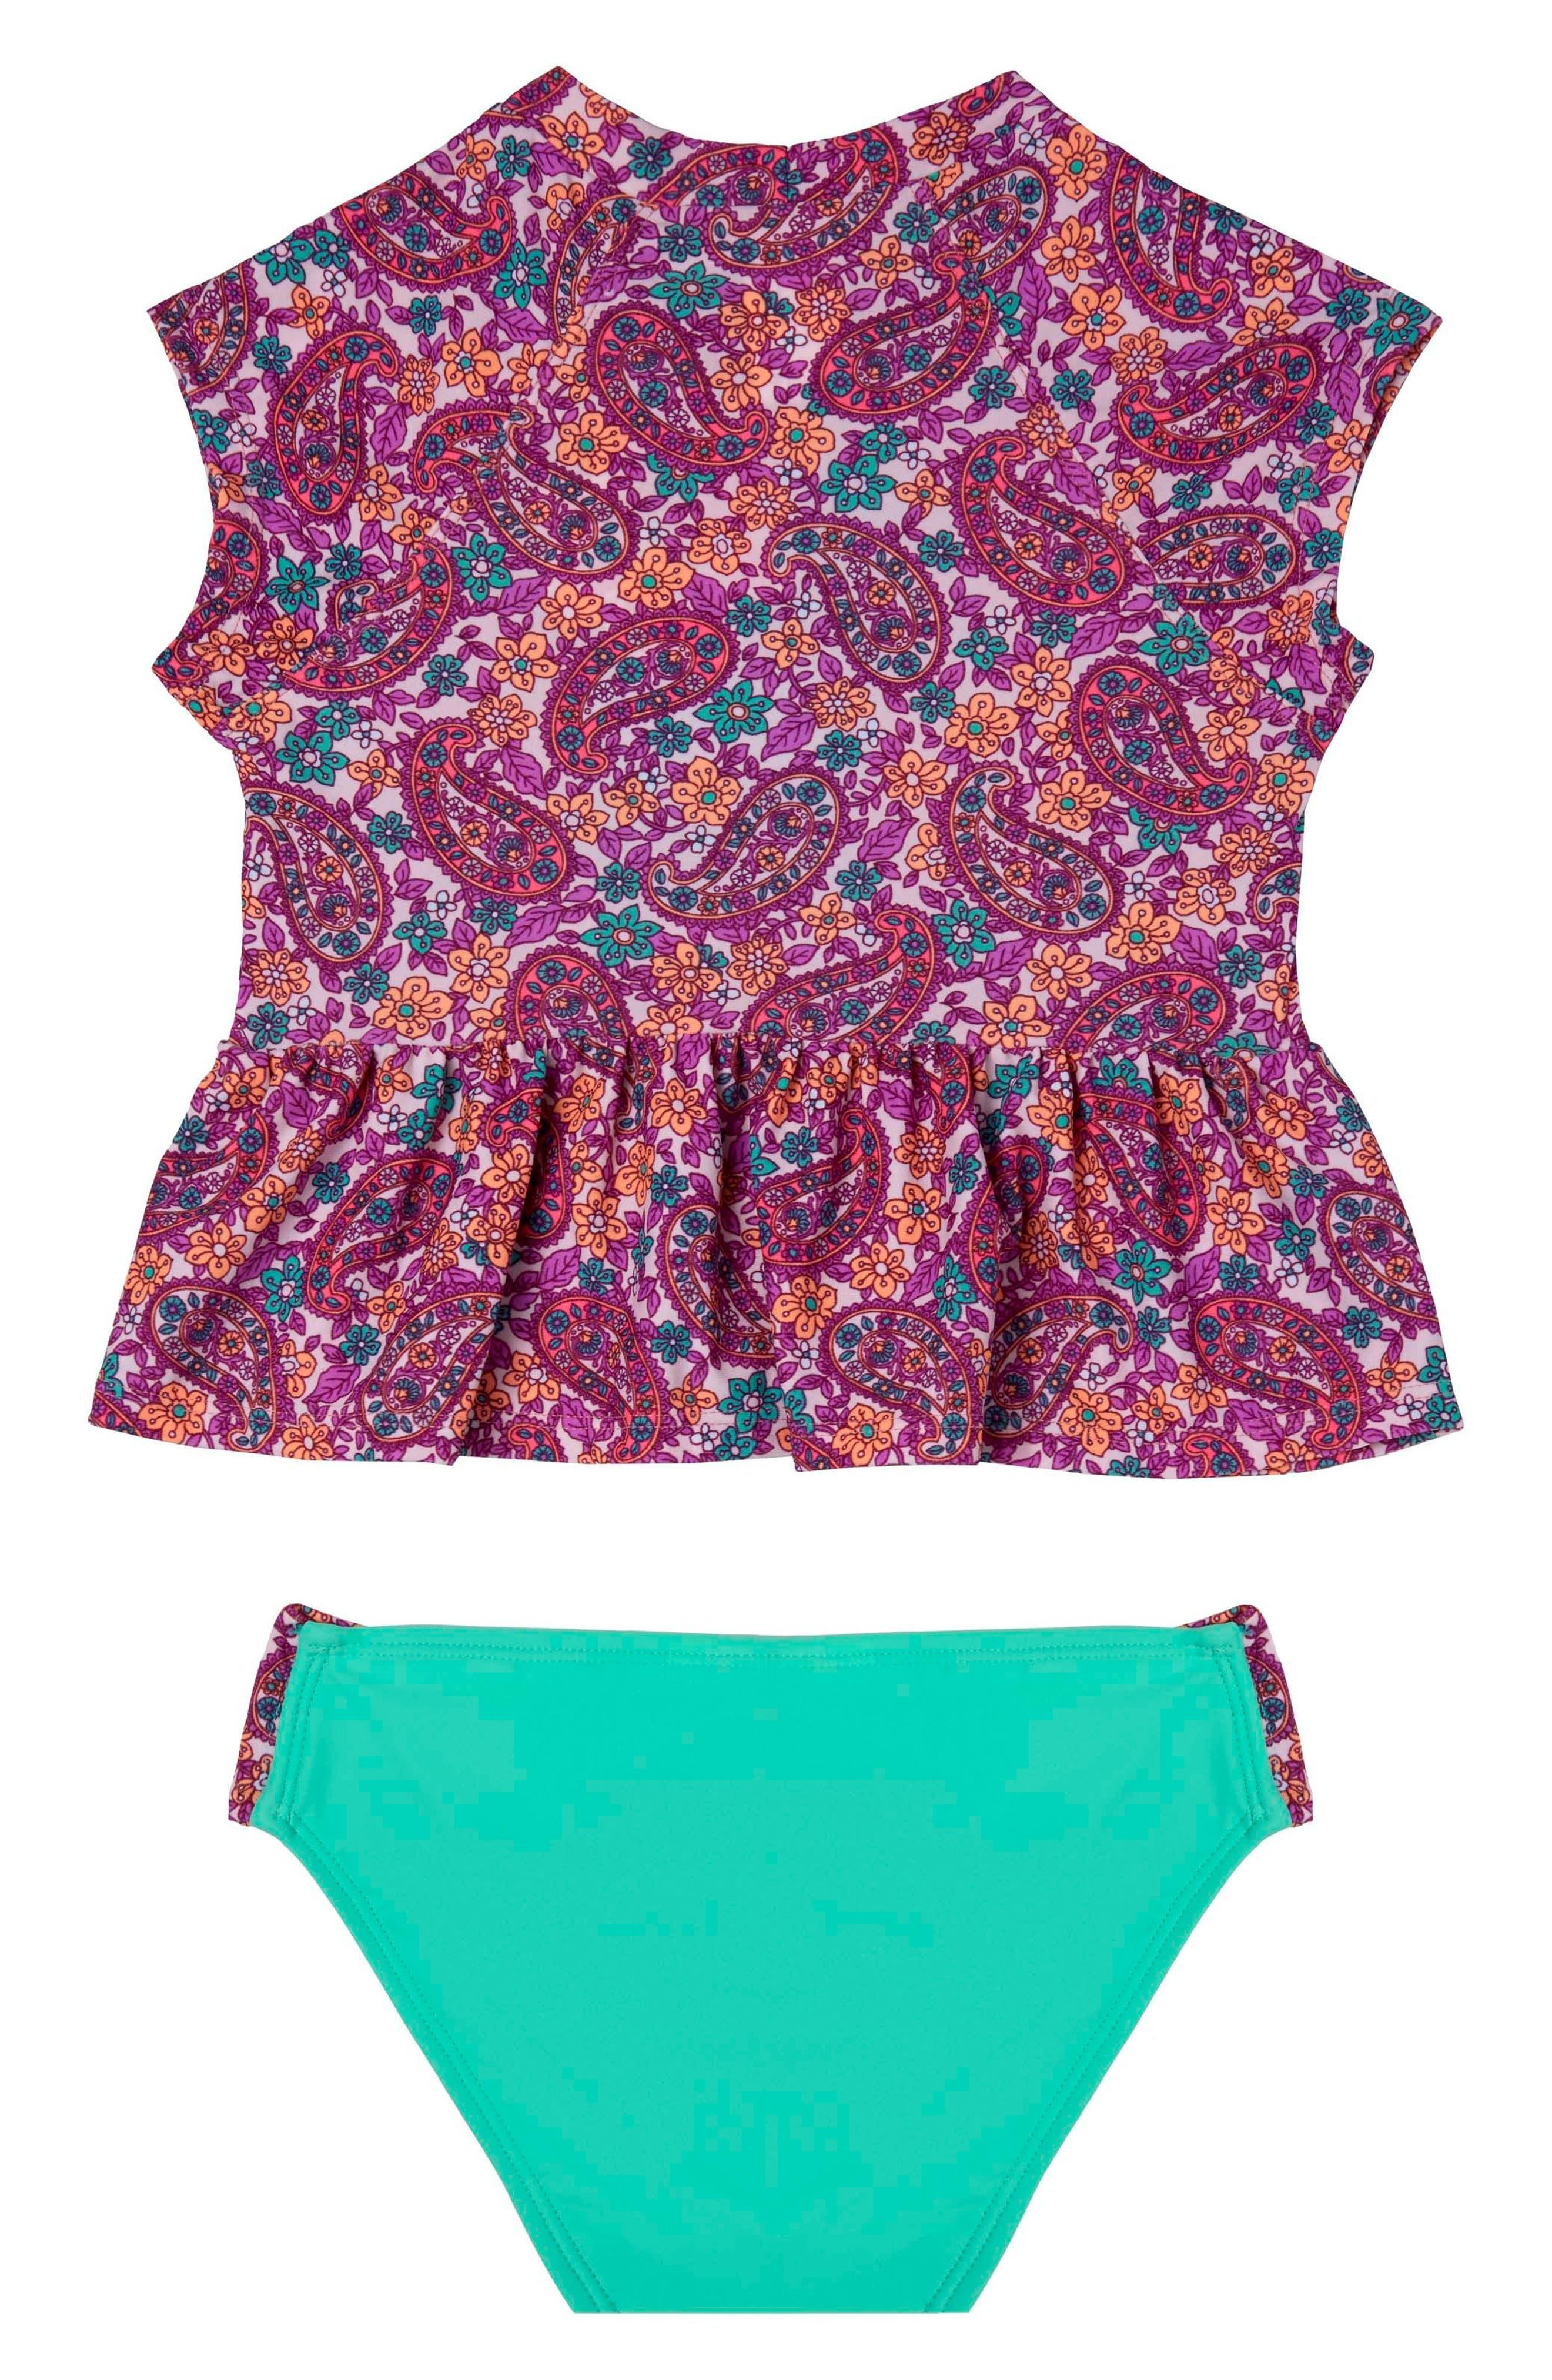 Paisley Dream Two-Piece Rashguard Swimsuit,                             Main thumbnail 1, color,                             658